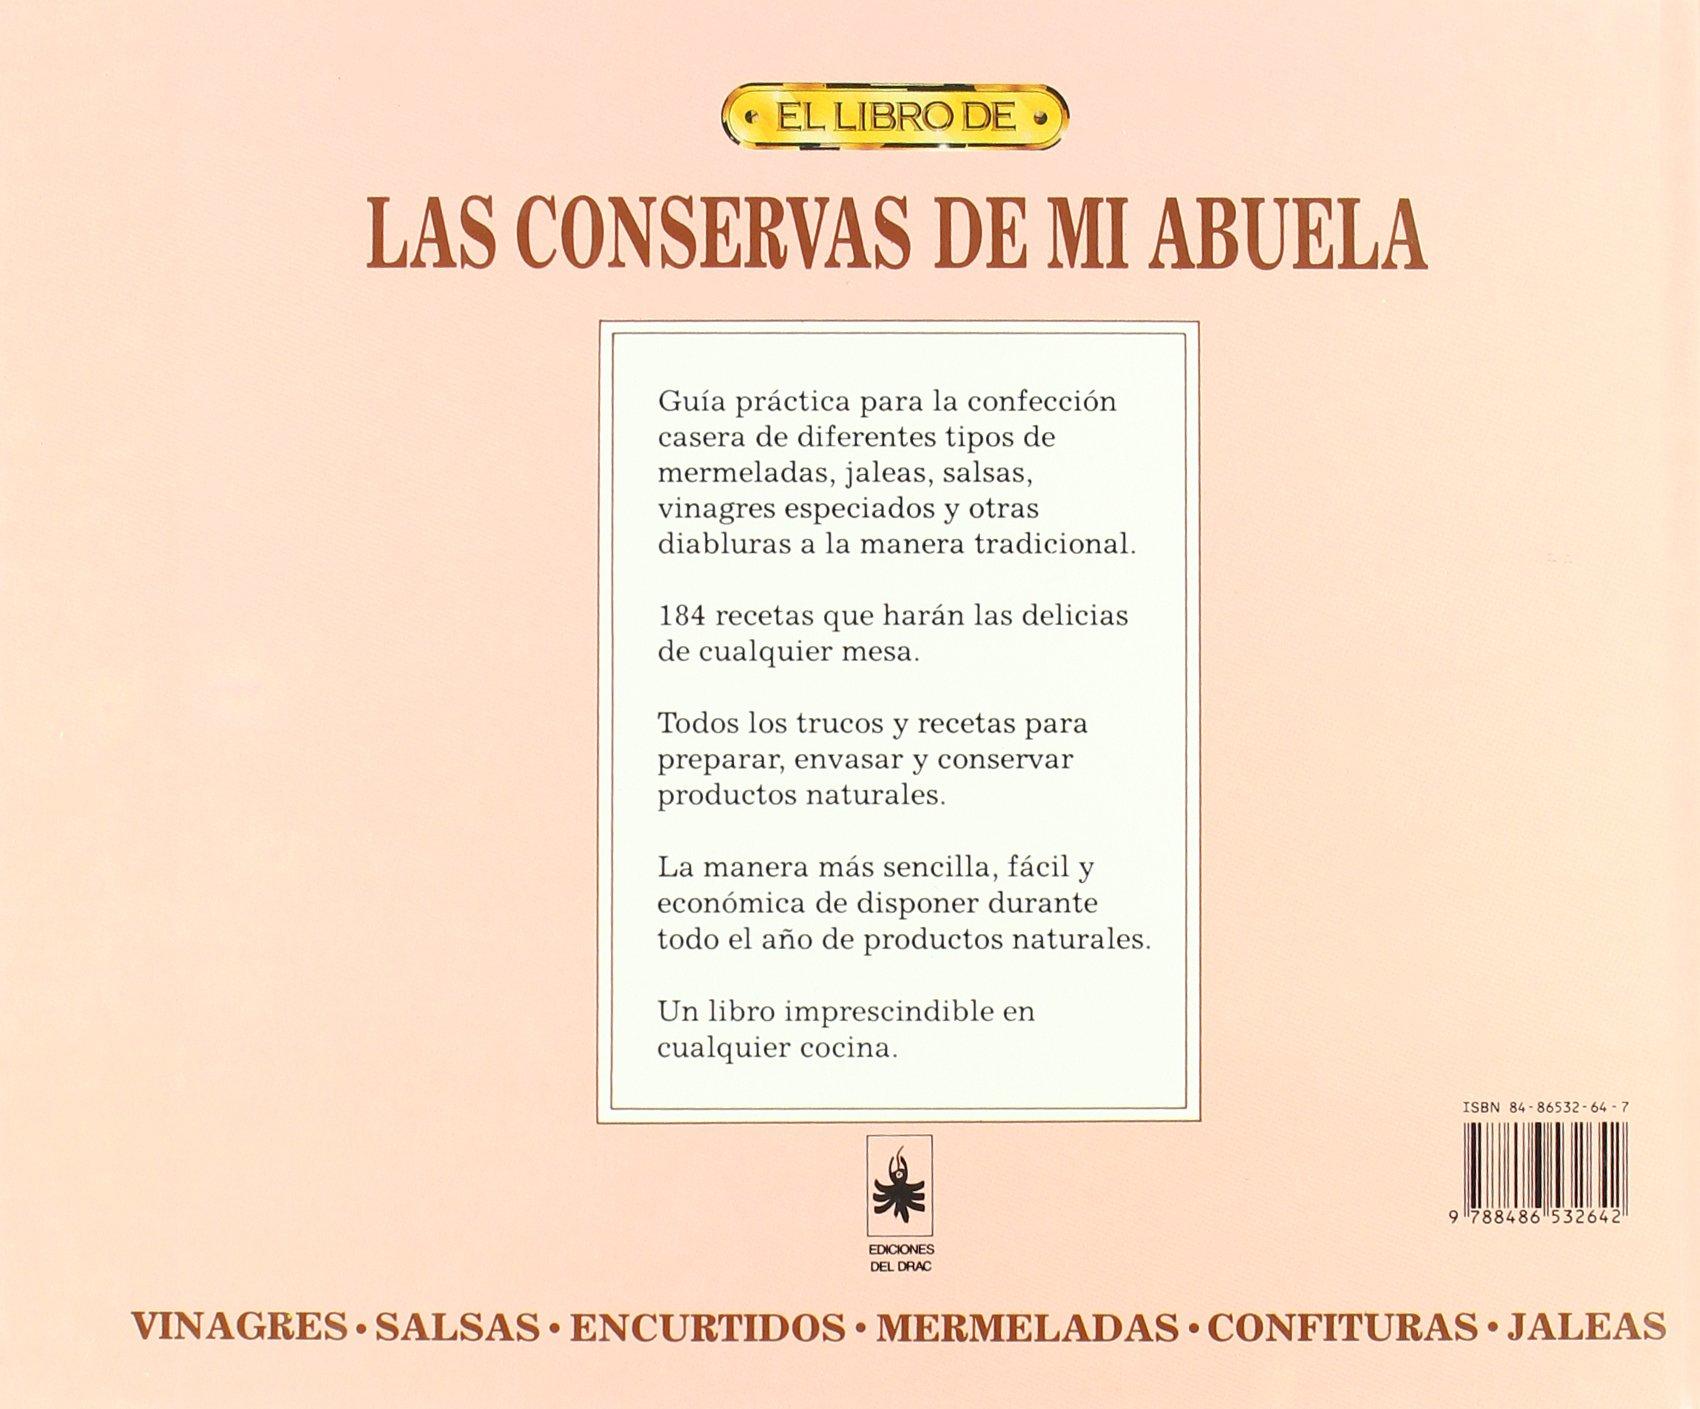 El Libro de Las Conservas de Mi Abuela (Spanish Edition): Tui Flower: 9788486532642: Amazon.com: Books